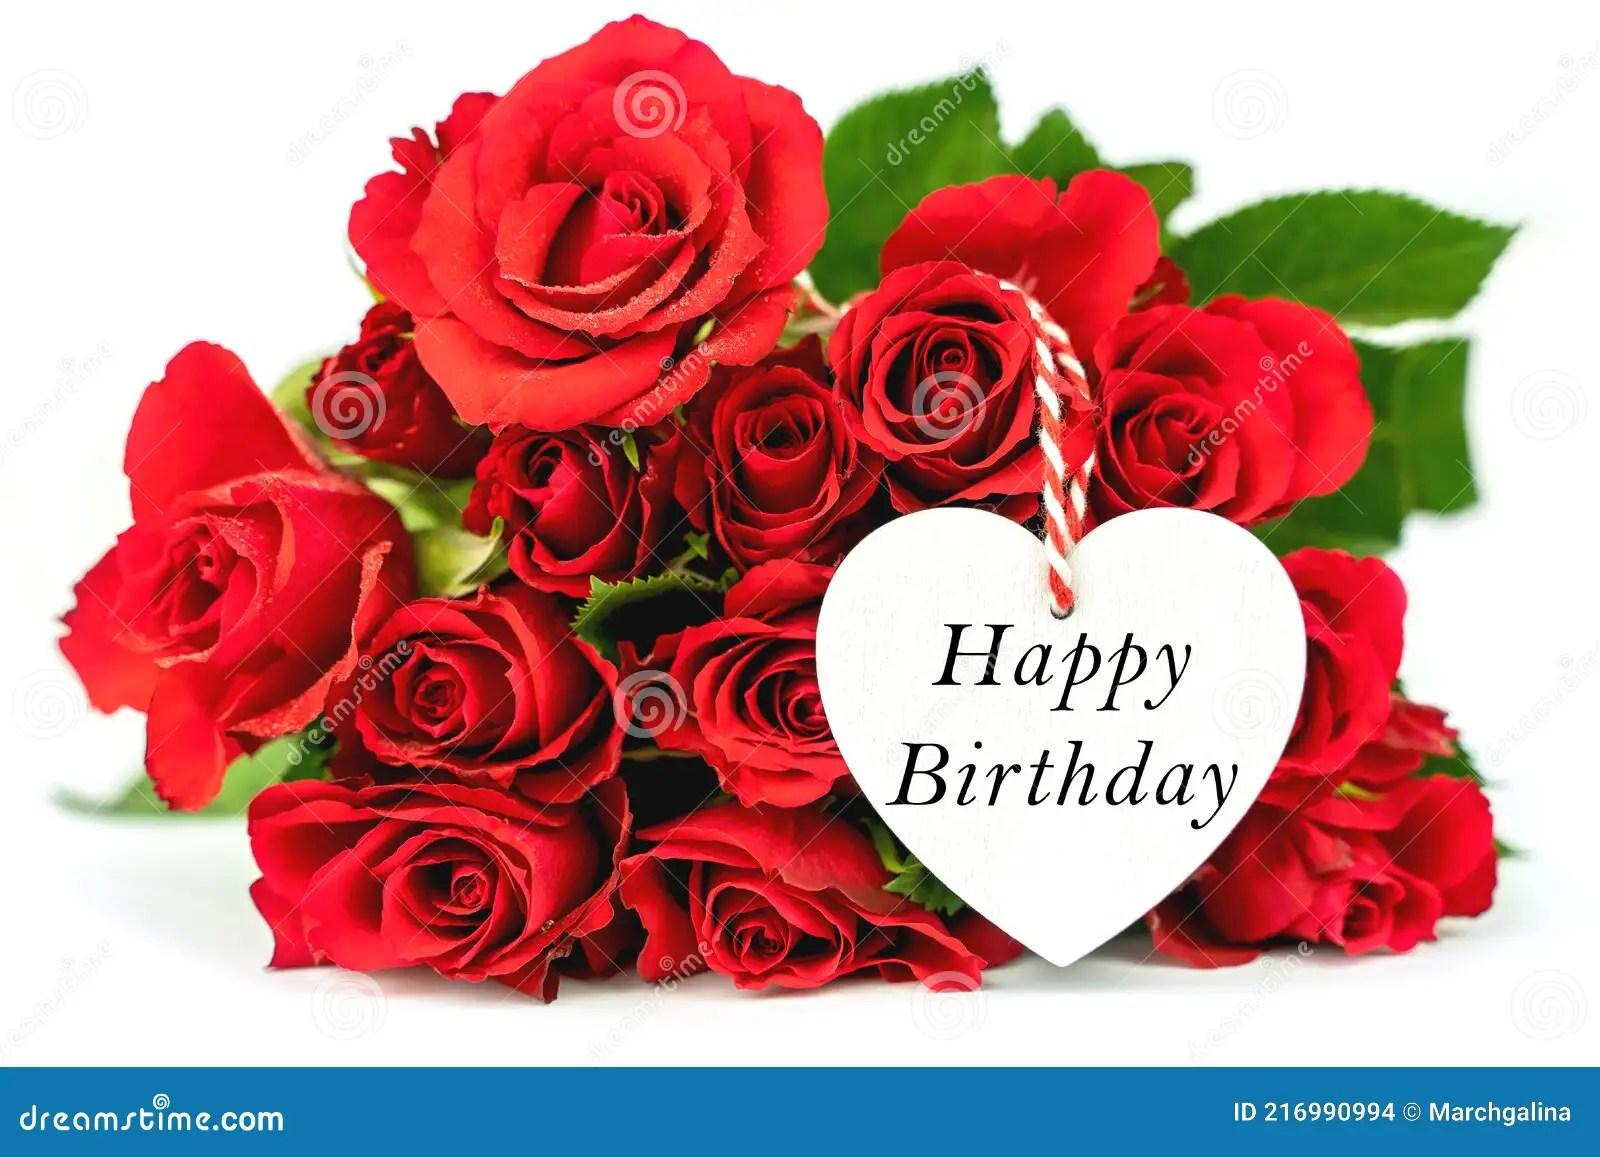 5 253 Happy Birthday Heart Roses Photos Free Royalty Free Stock Photos From Dreamstime